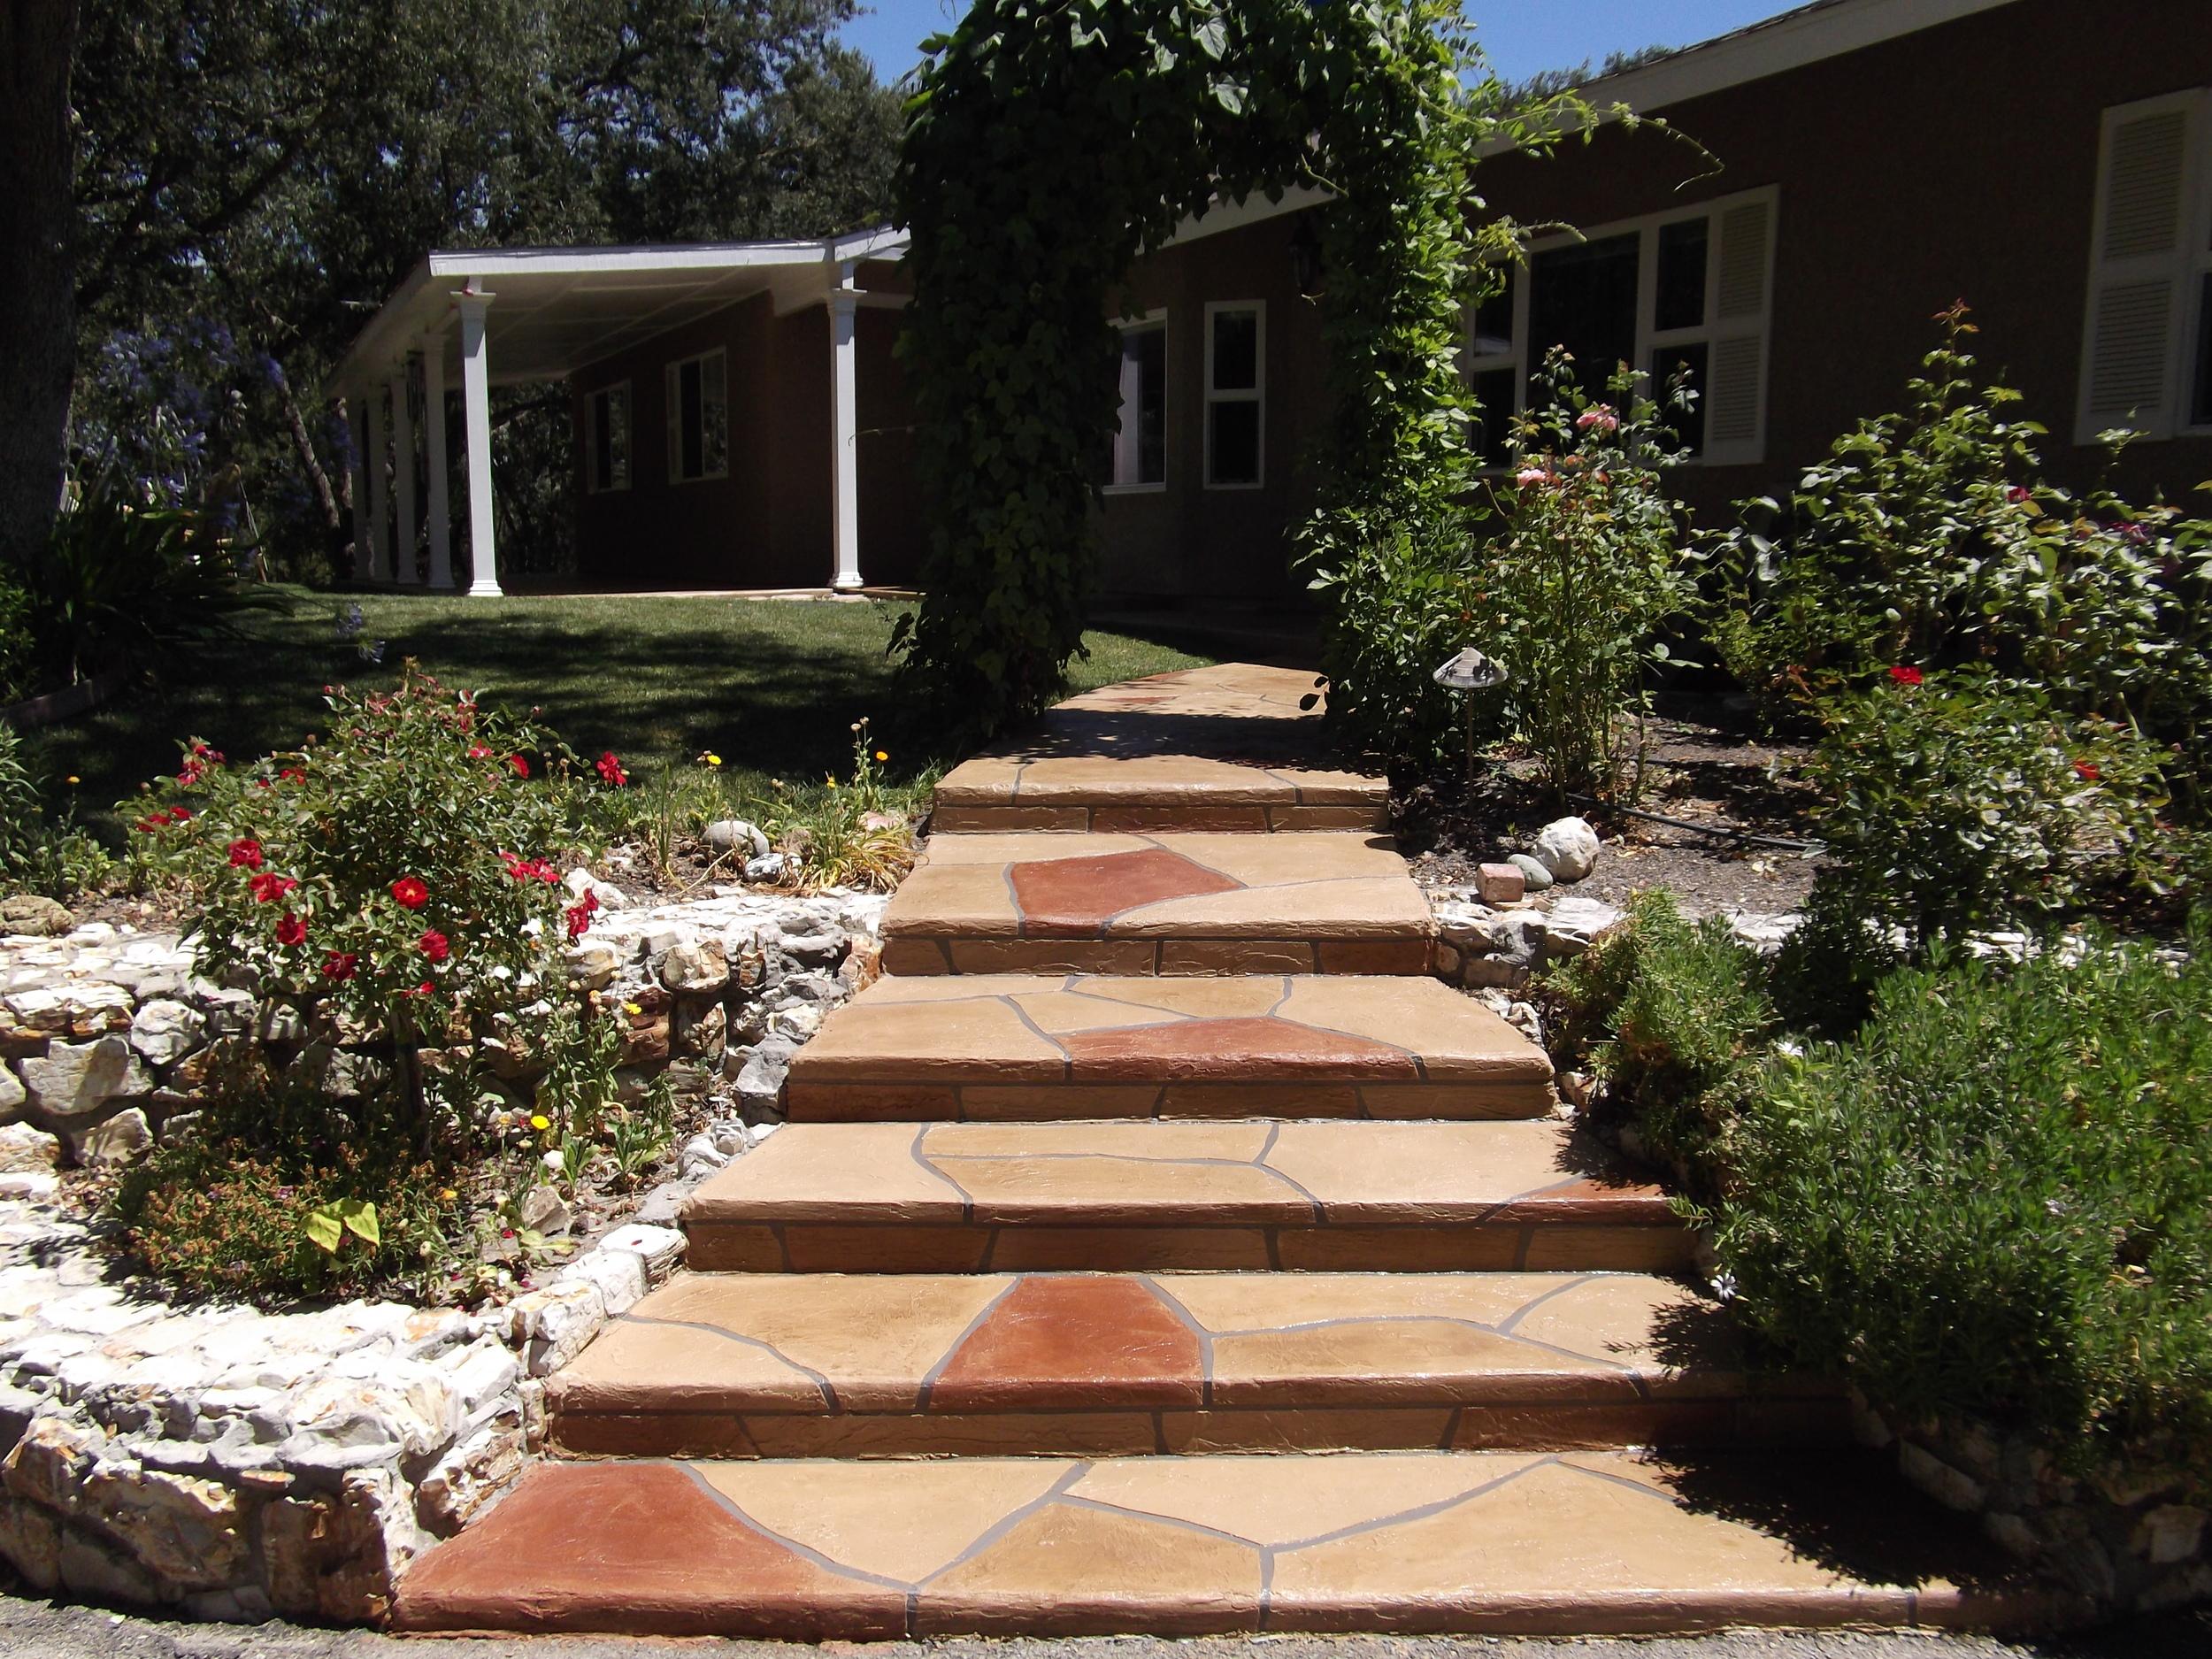 Flagstone walk and steps